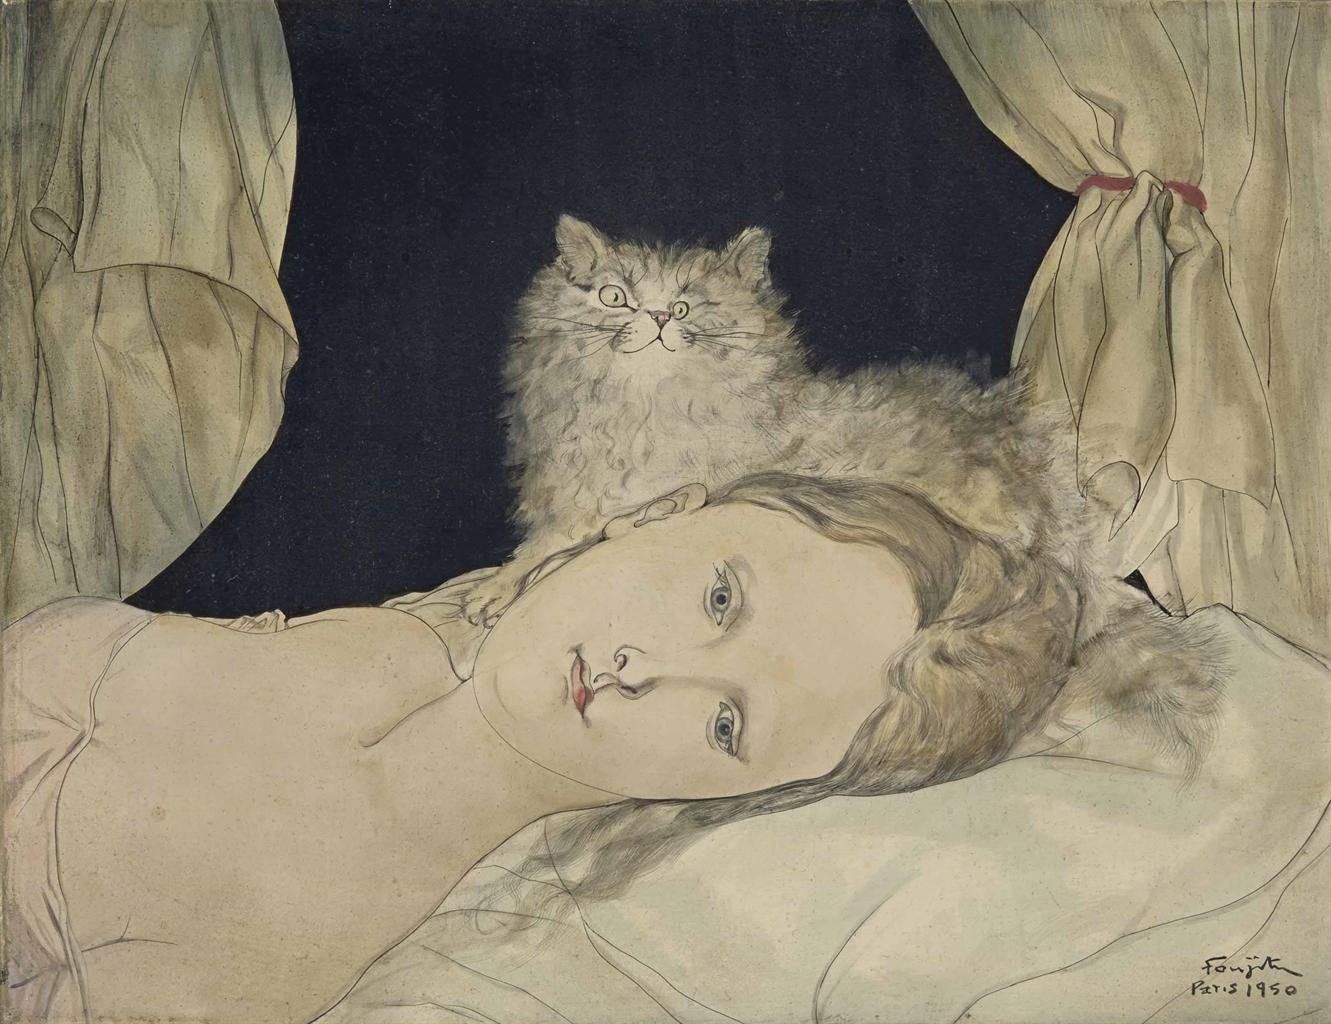 Tsuguharu Foujita-Buste de femme allongee au chat-1950